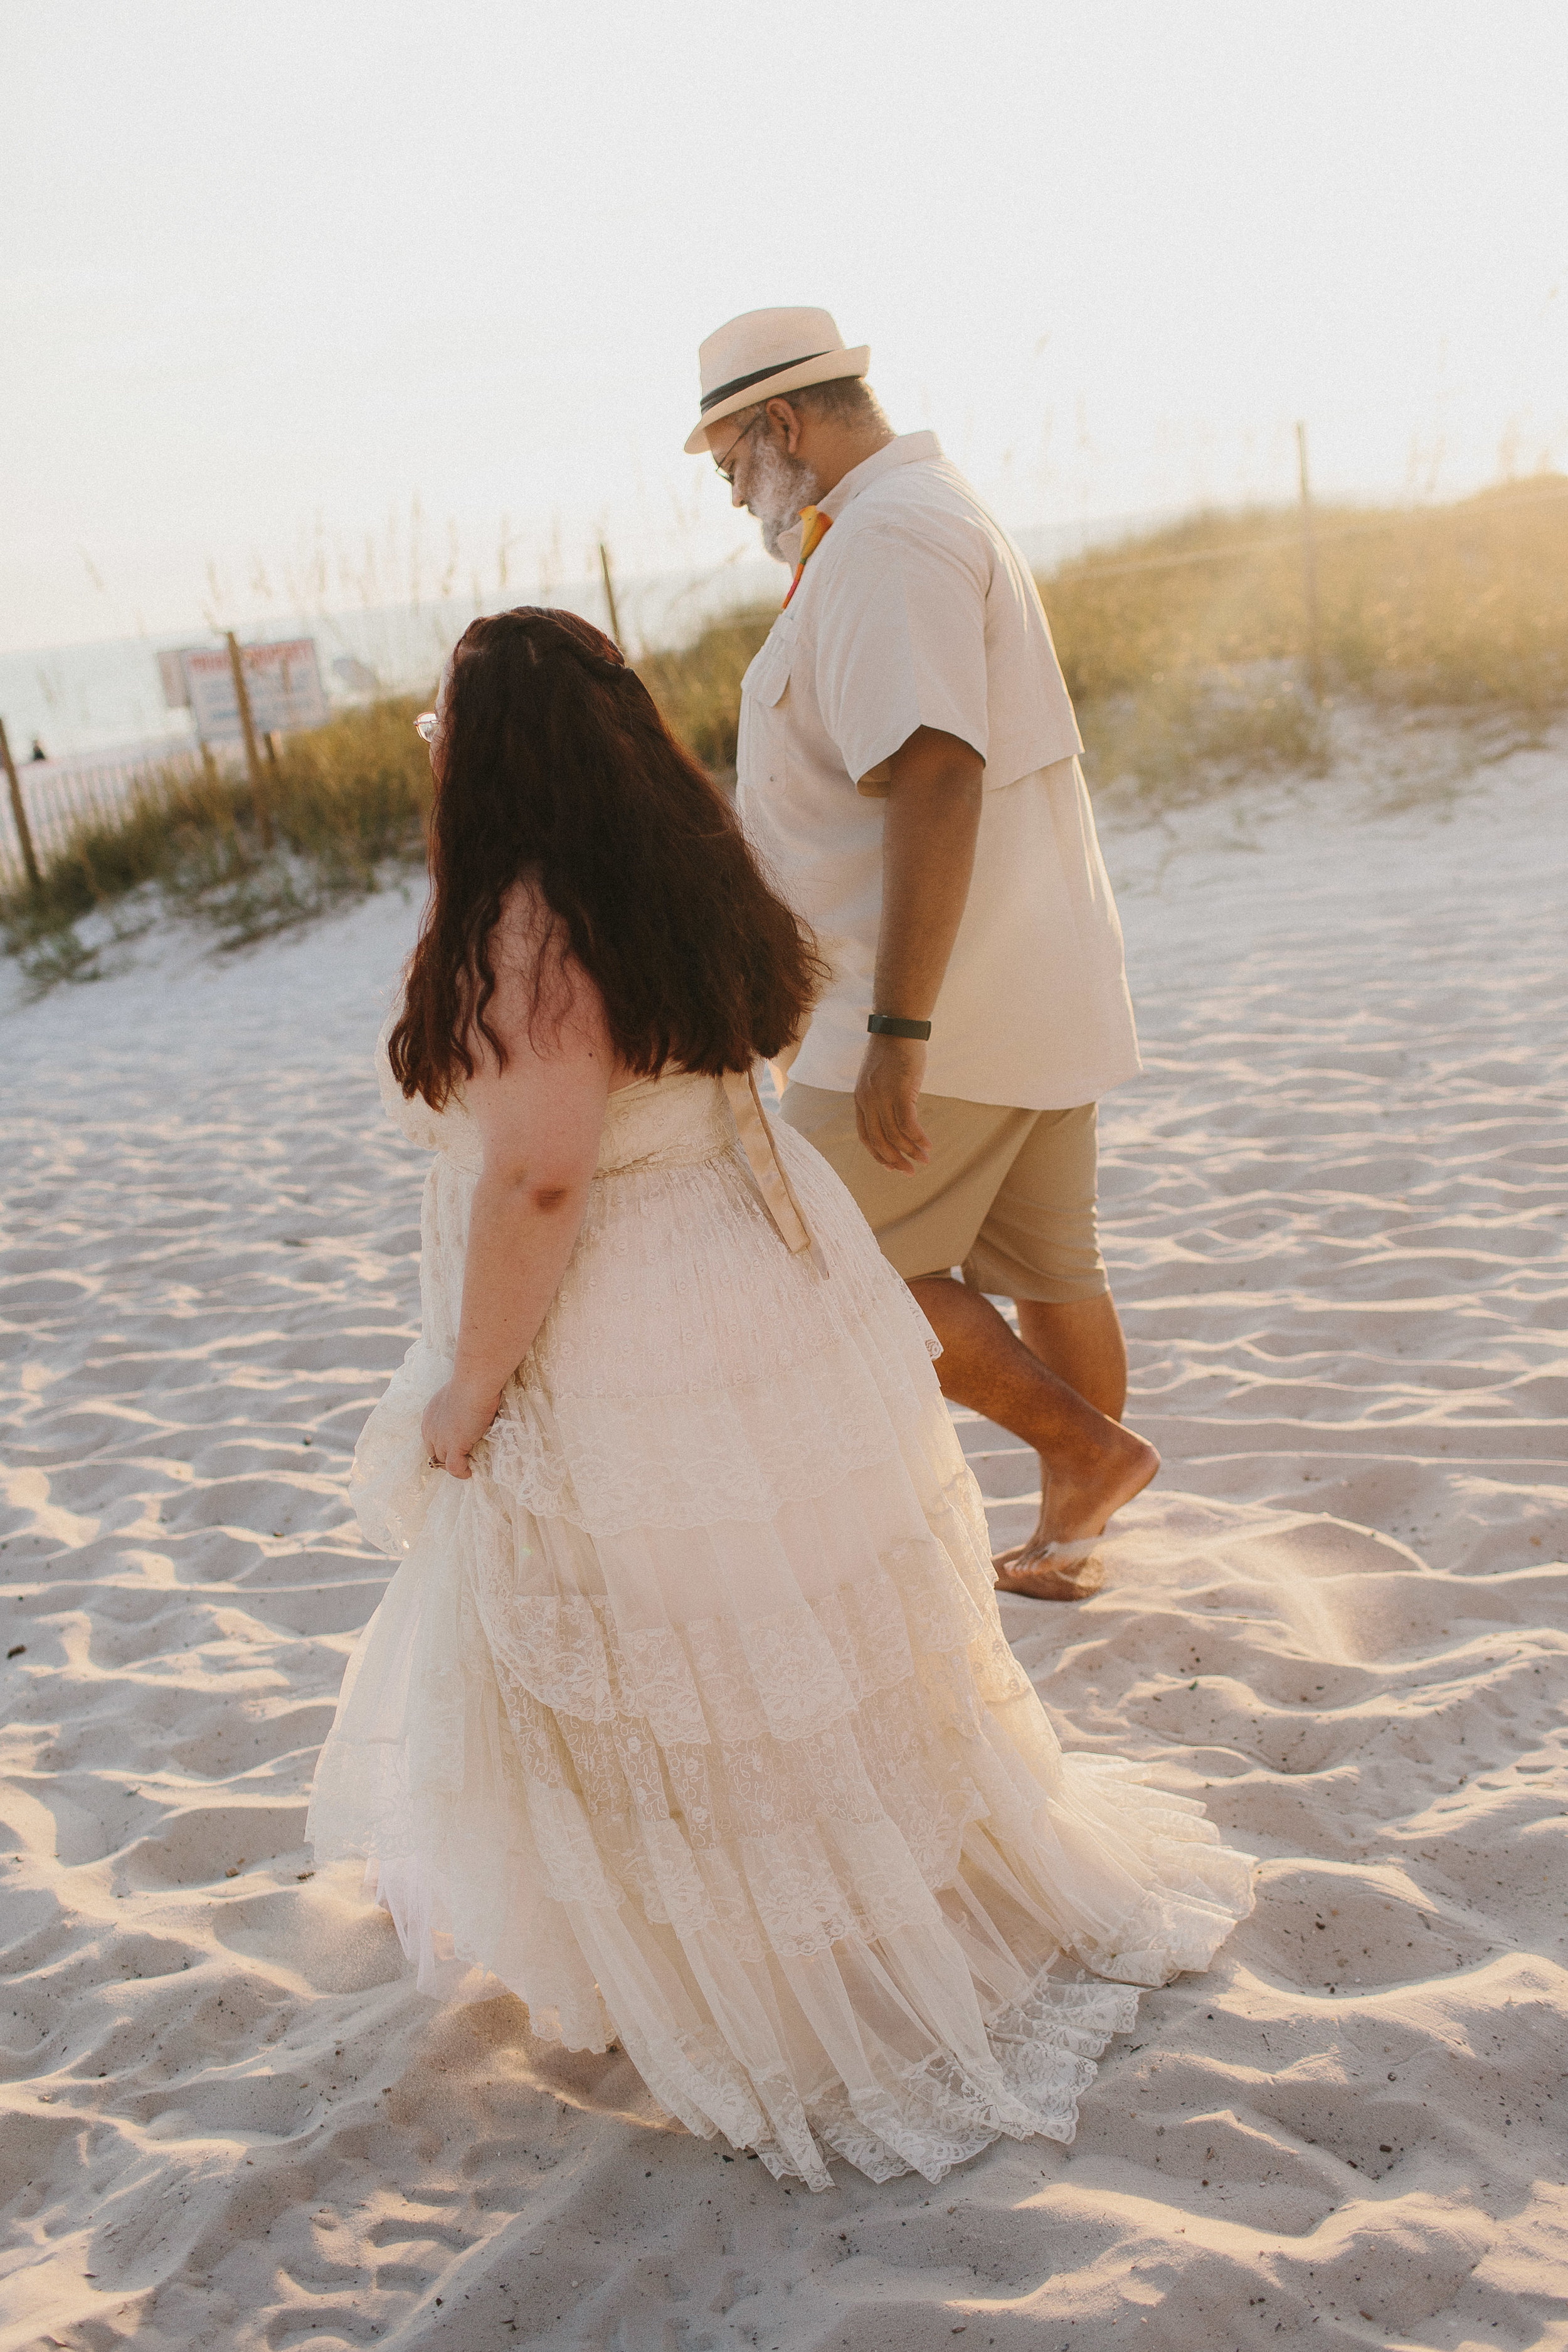 destin_sunset_beach_elopement_intimate_wedding_photographer_florida_documentary_1148.jpg